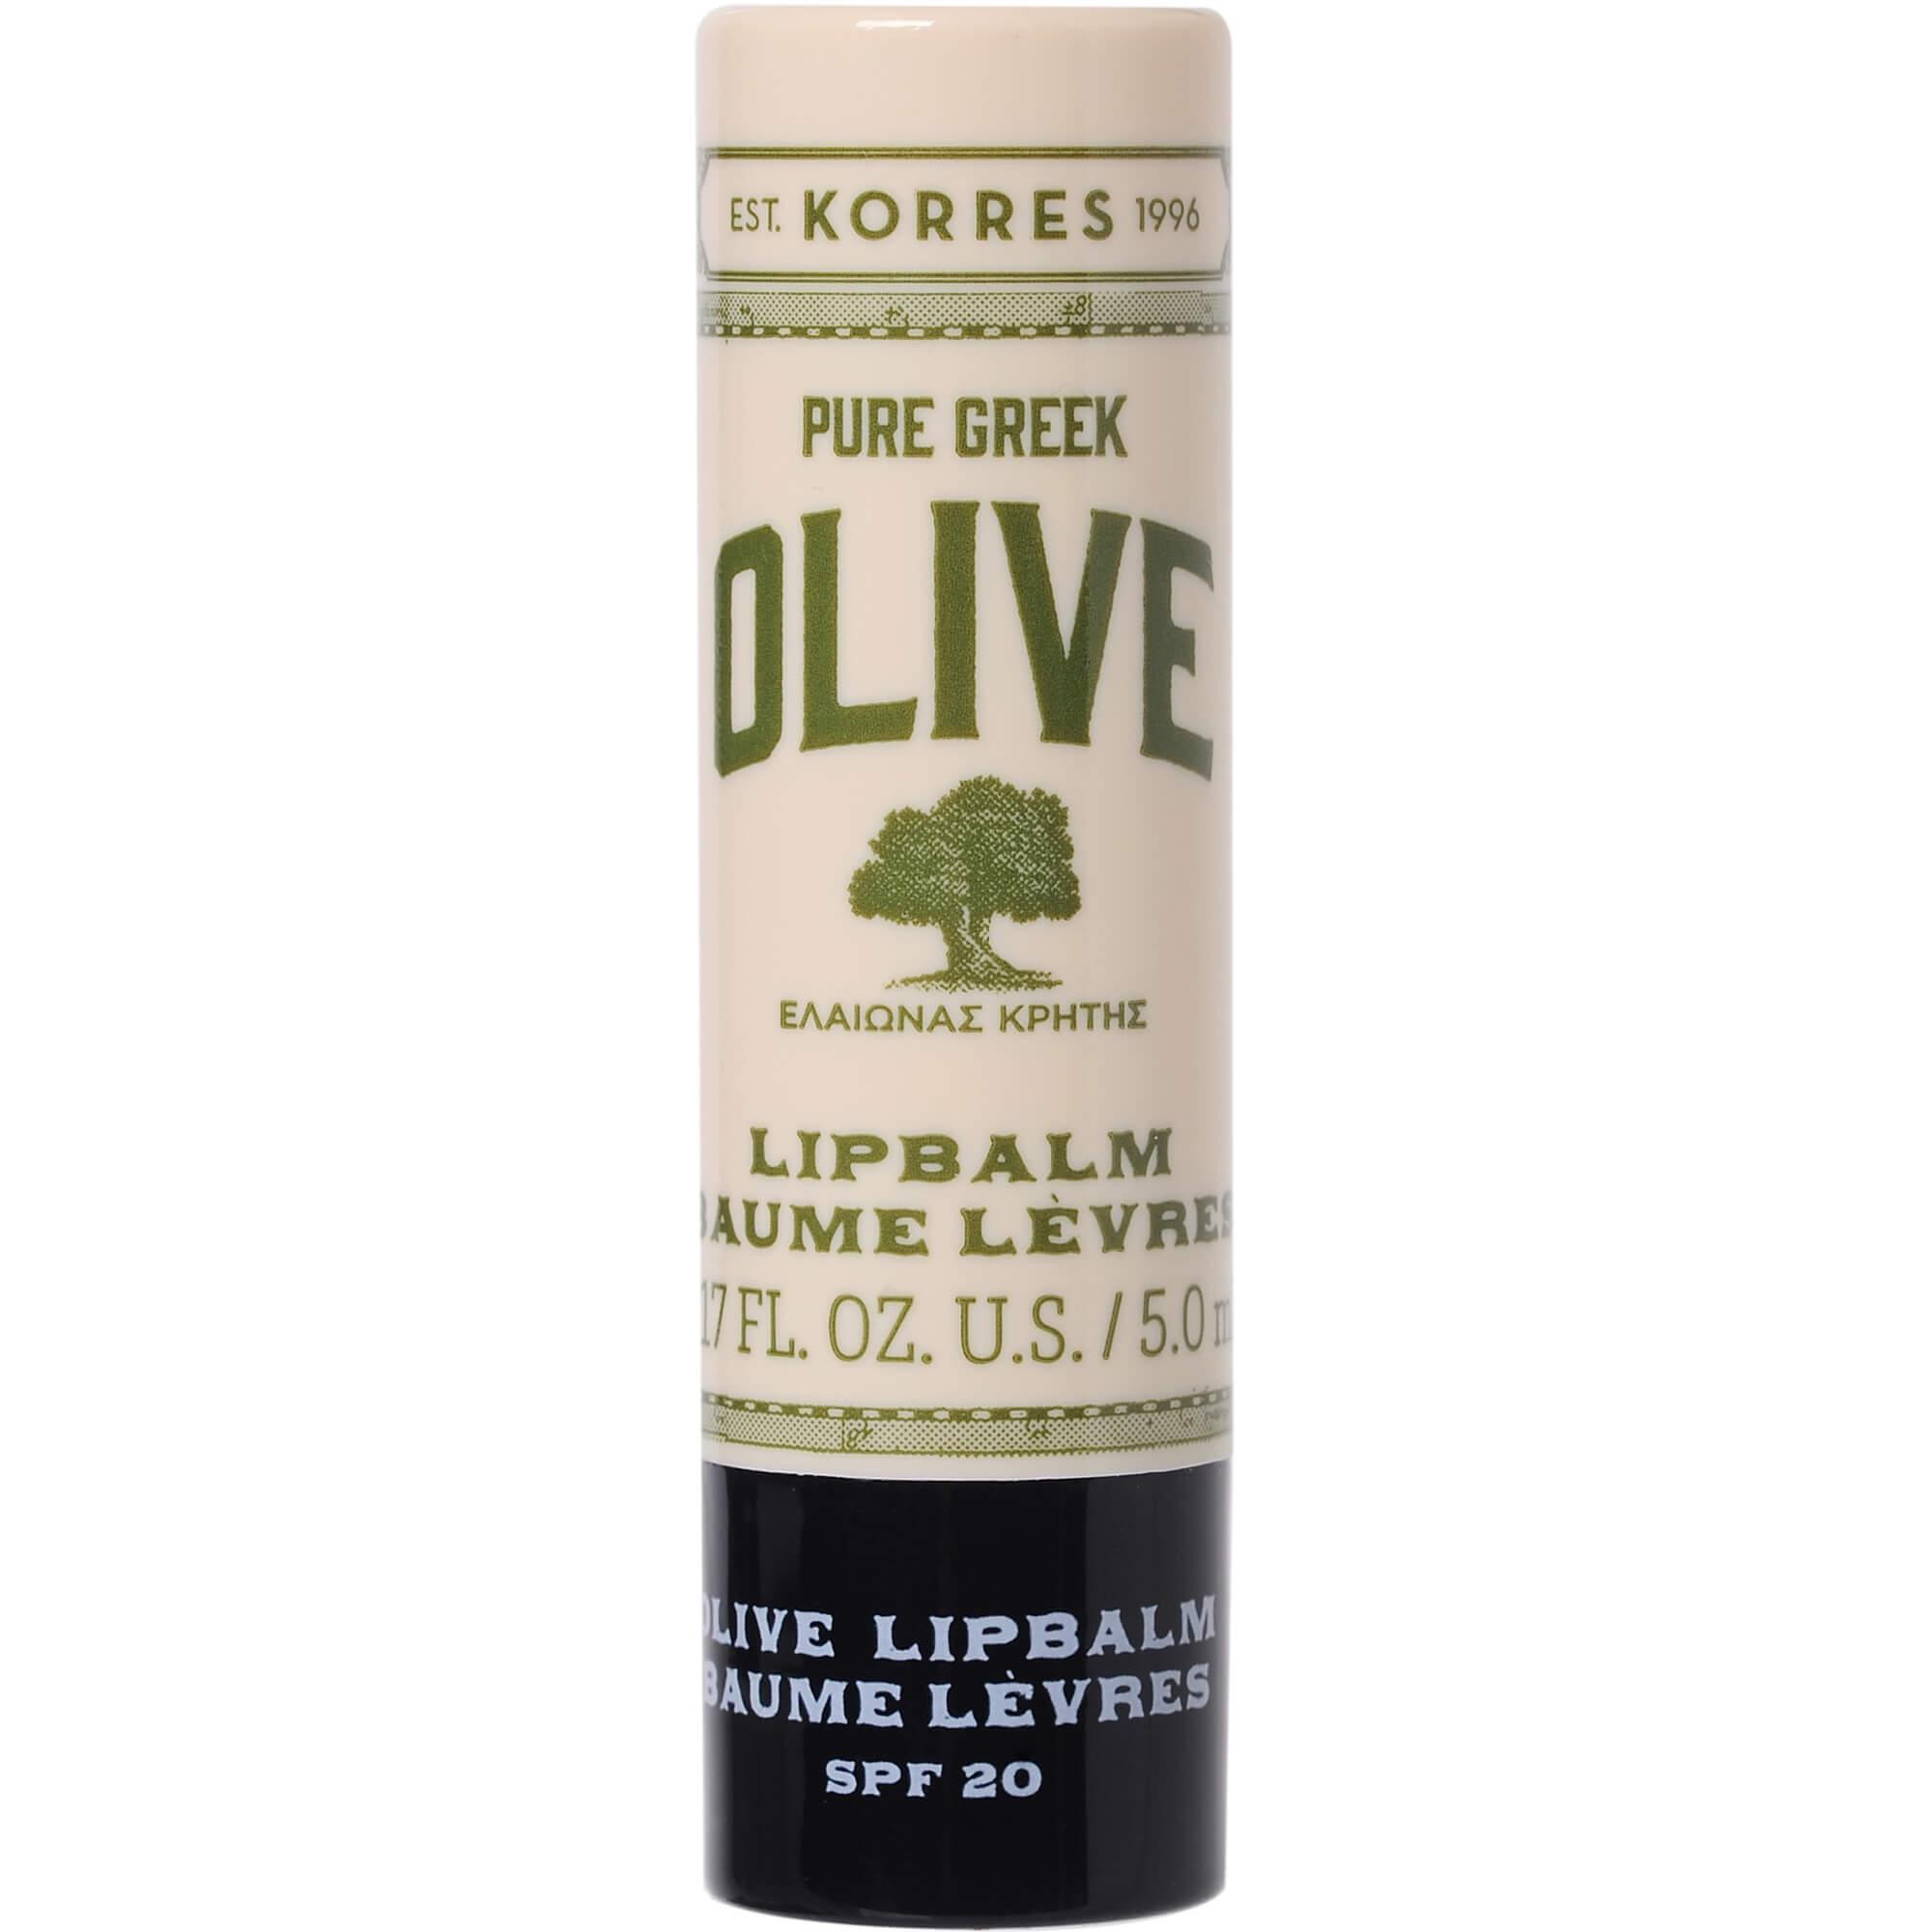 Korres Pure Greek Olive Extra Care Lip Balm Spf20 Θρέψη, Ενυδάτωση στα Ξηρά Σκασμένα Χείλη με Κερί Μελισσών & Έλαιο Ηλίανθου 5ml